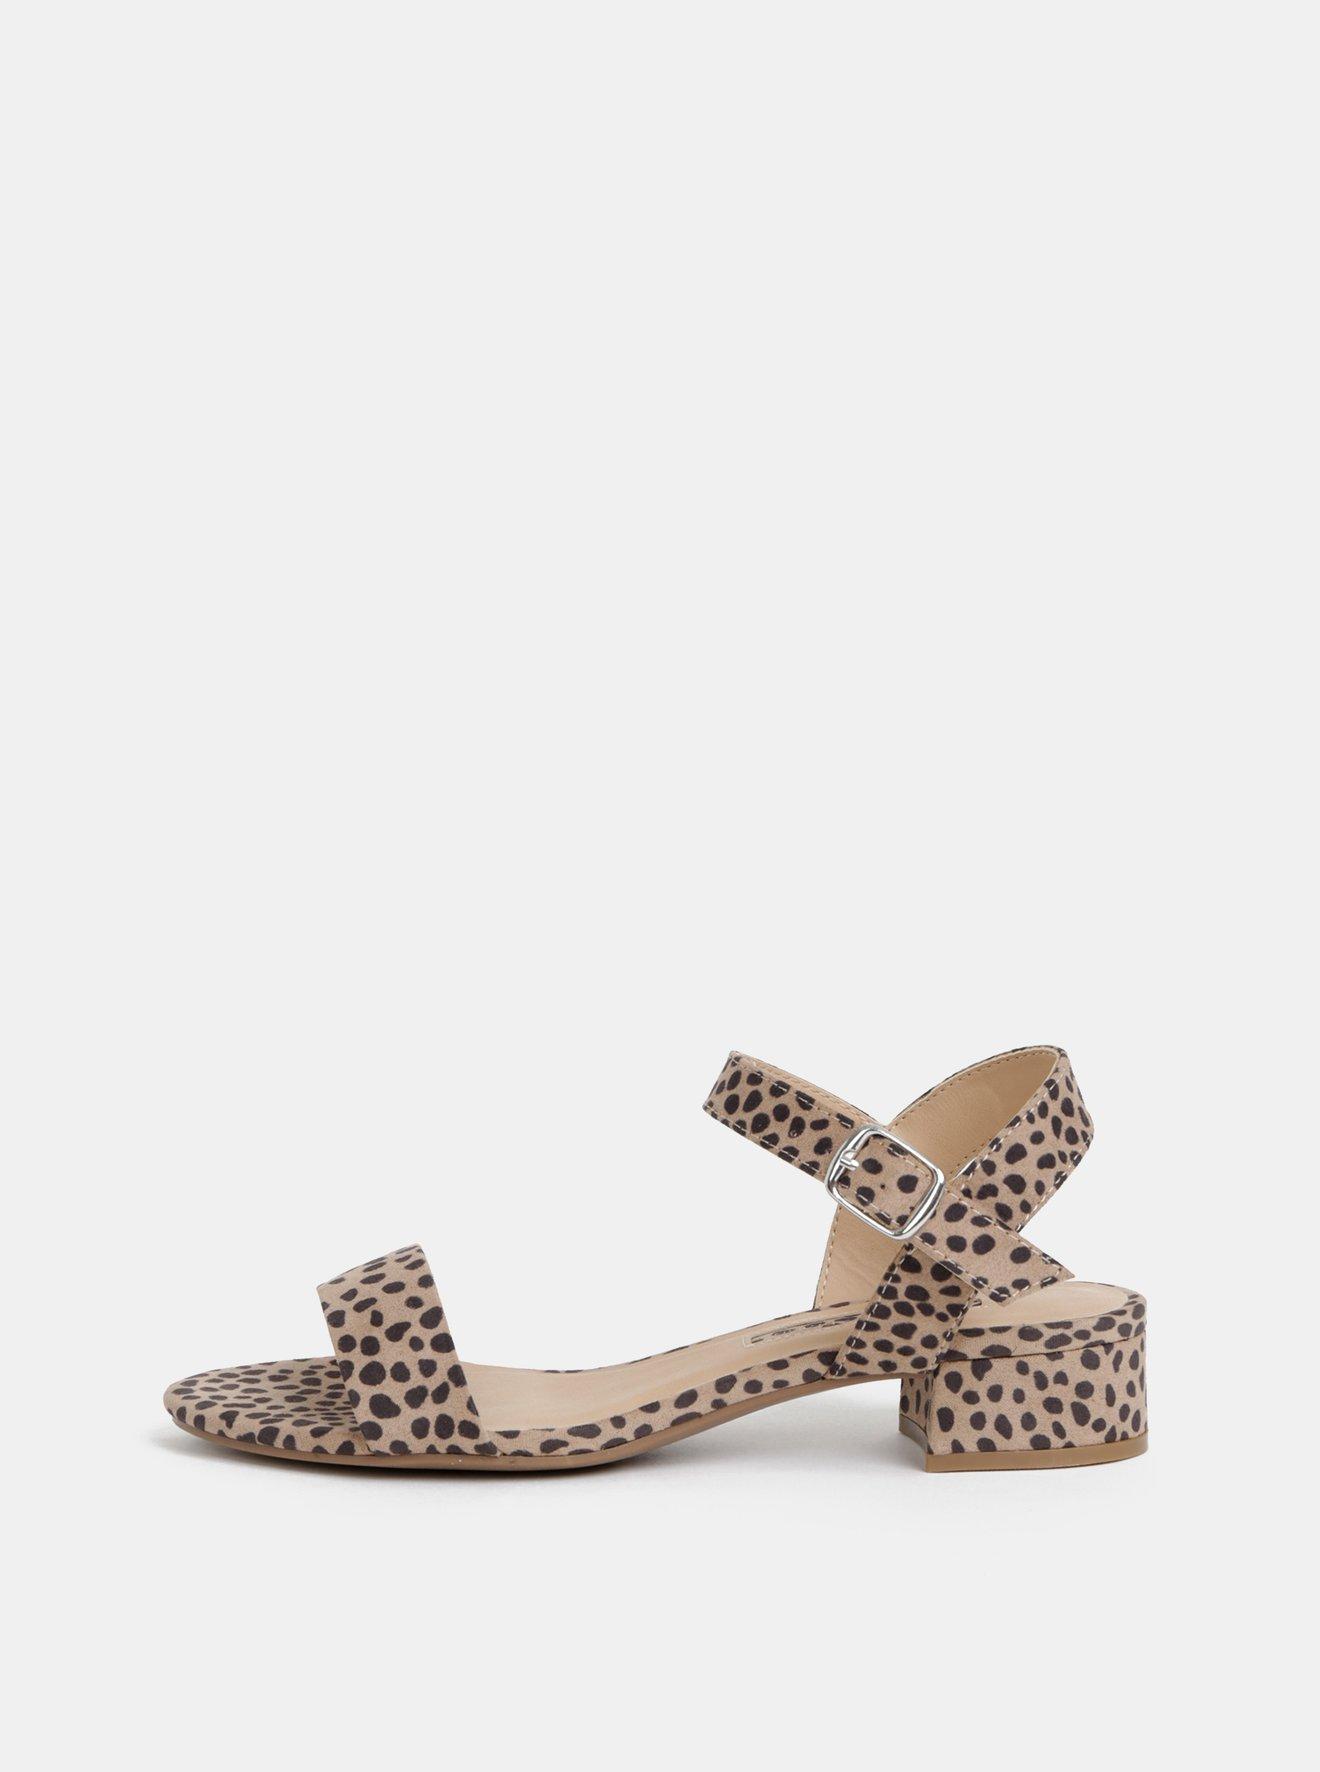 f54c7c2709 Béžové sandály s gepardím vzorem Dorothy Perkins